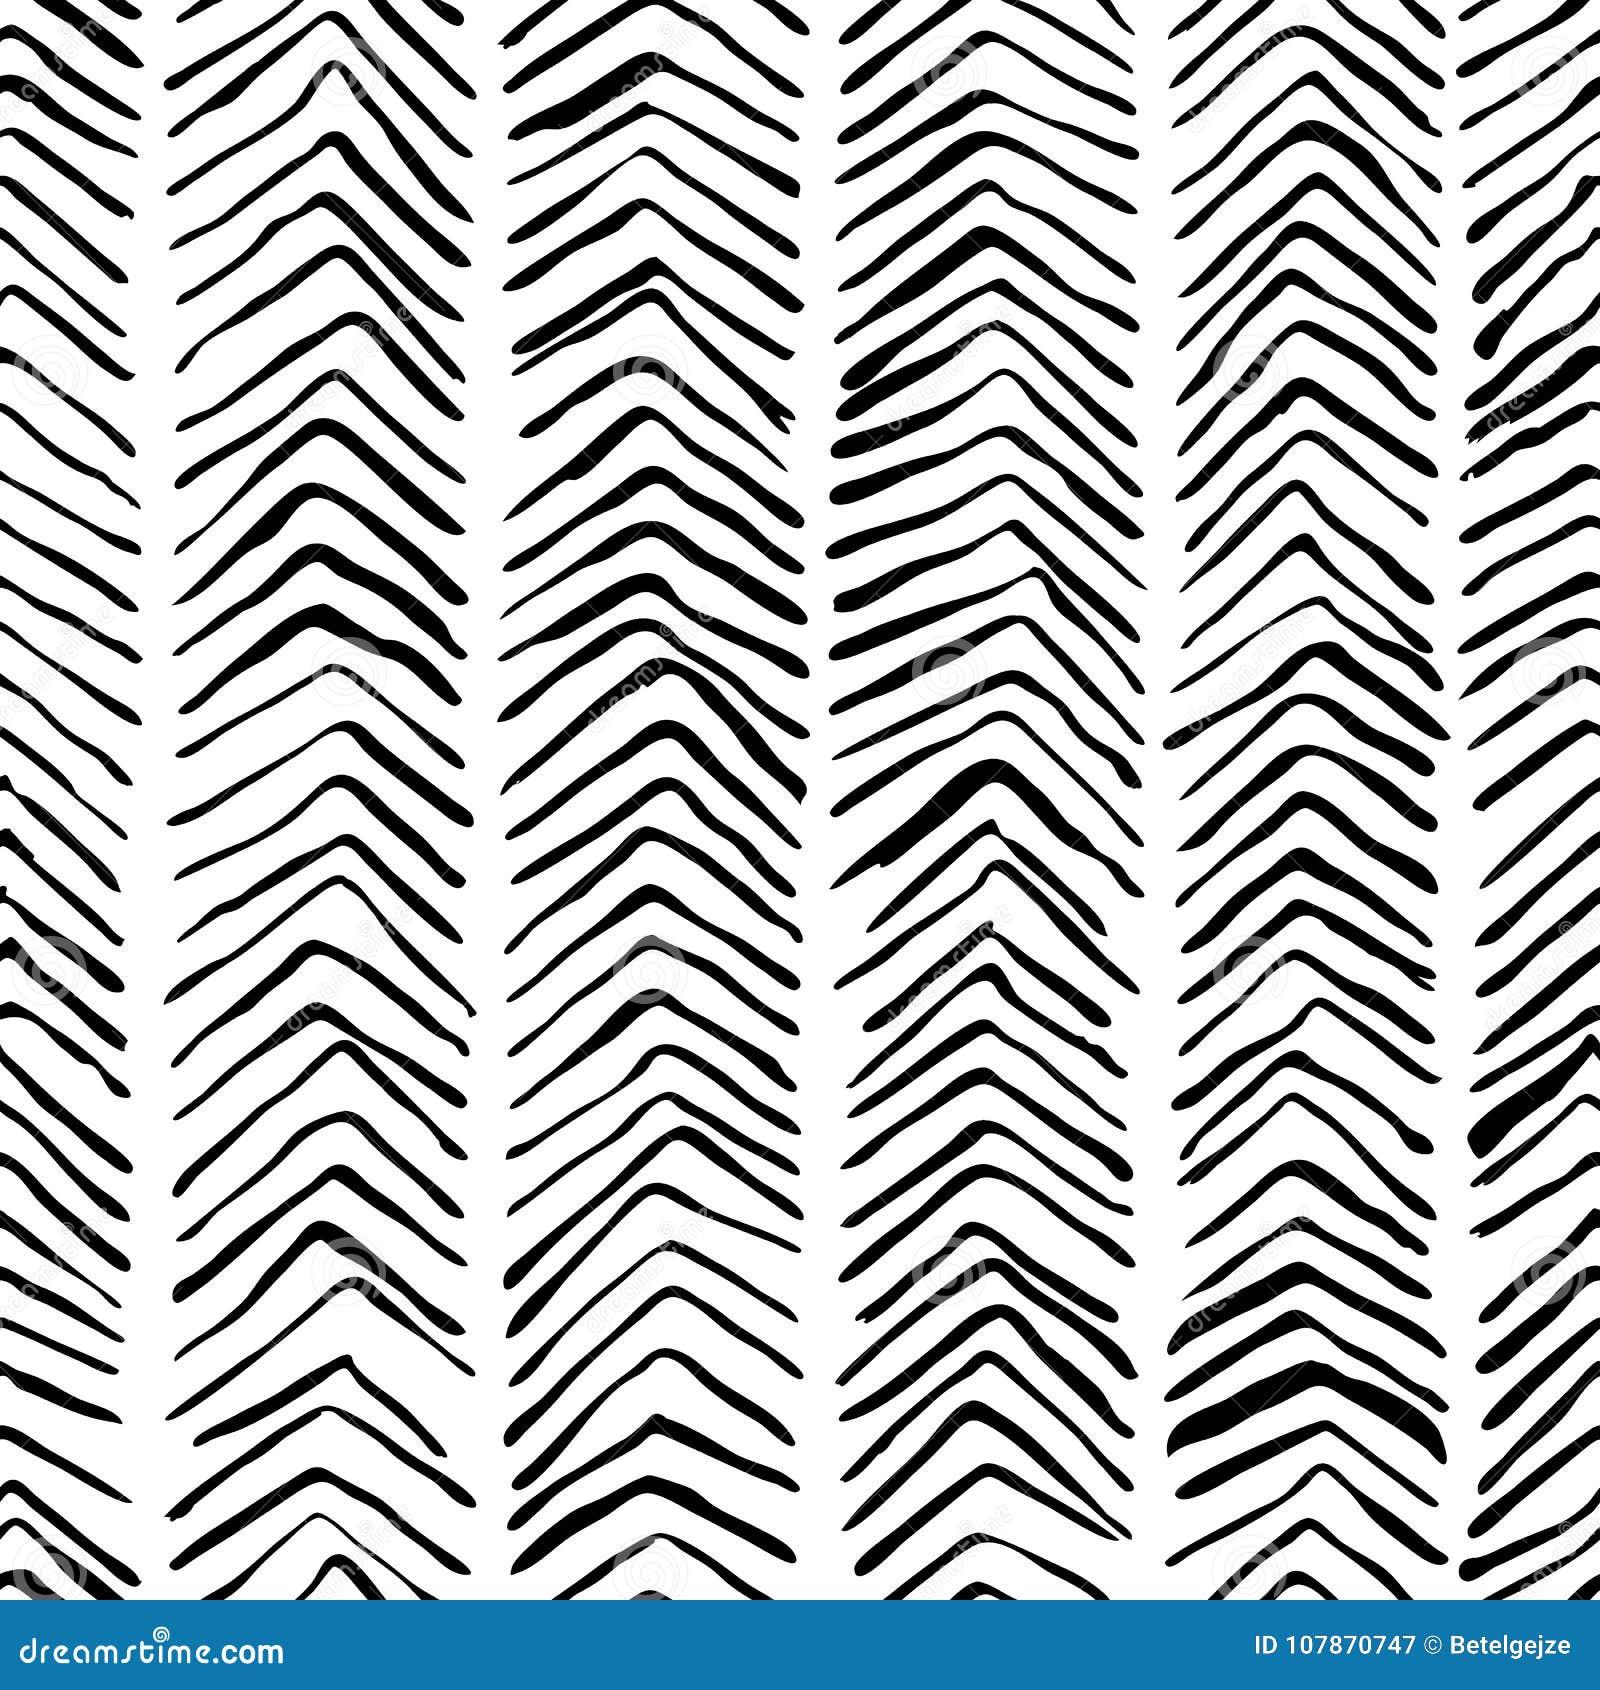 Vector Black White Herringbone Seamless Pattern Watercolor Ink Background Scandinavian Design Fashion Textile Print Stock Vector Illustration Of Hand Cover 107870747